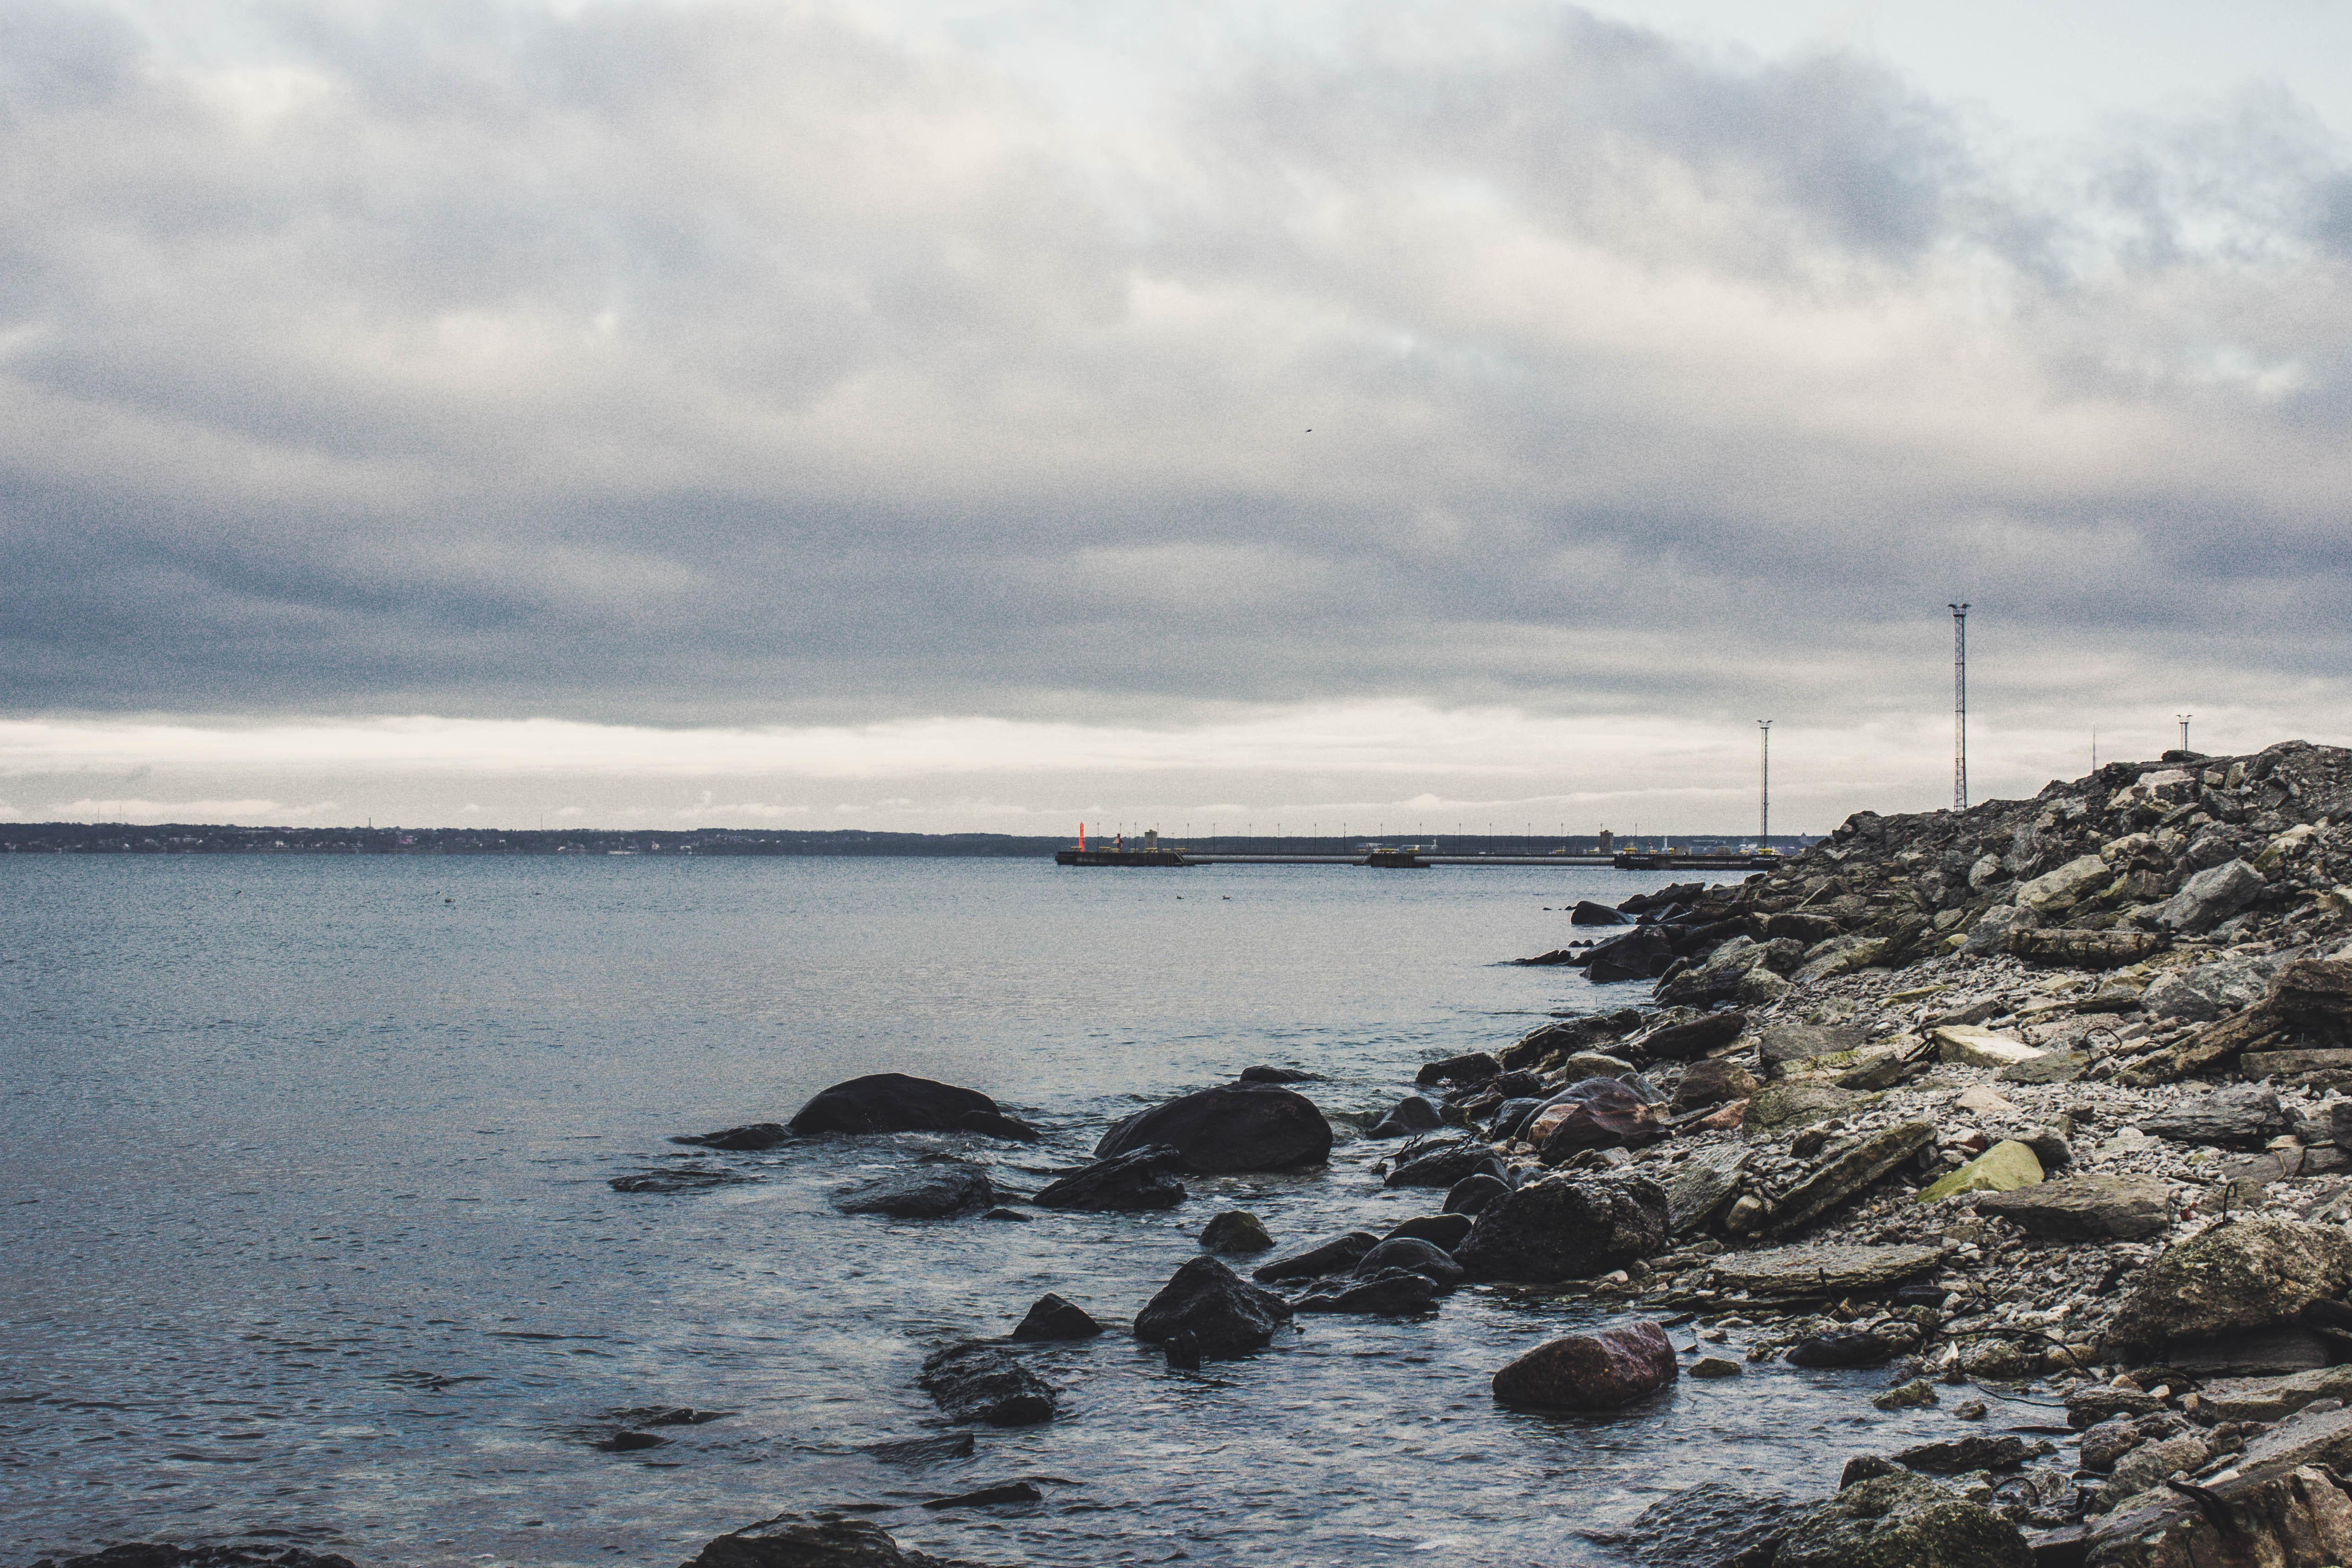 Rocks beneath the sea under cloudy sky photo